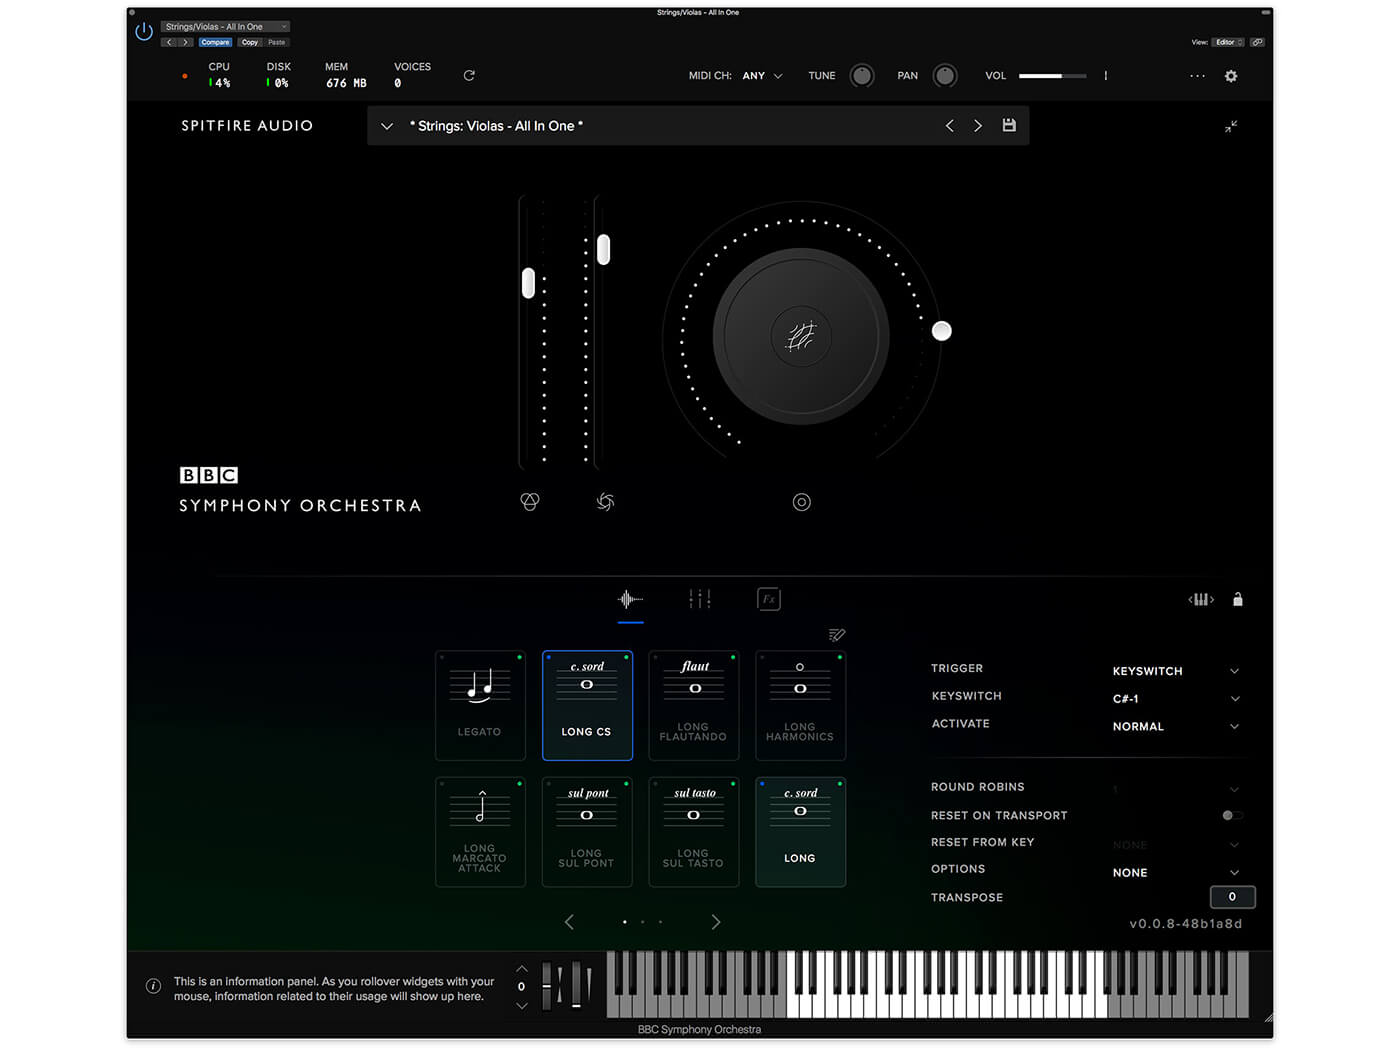 Spitfire Audio BBC Symphony Orchestra (UI)